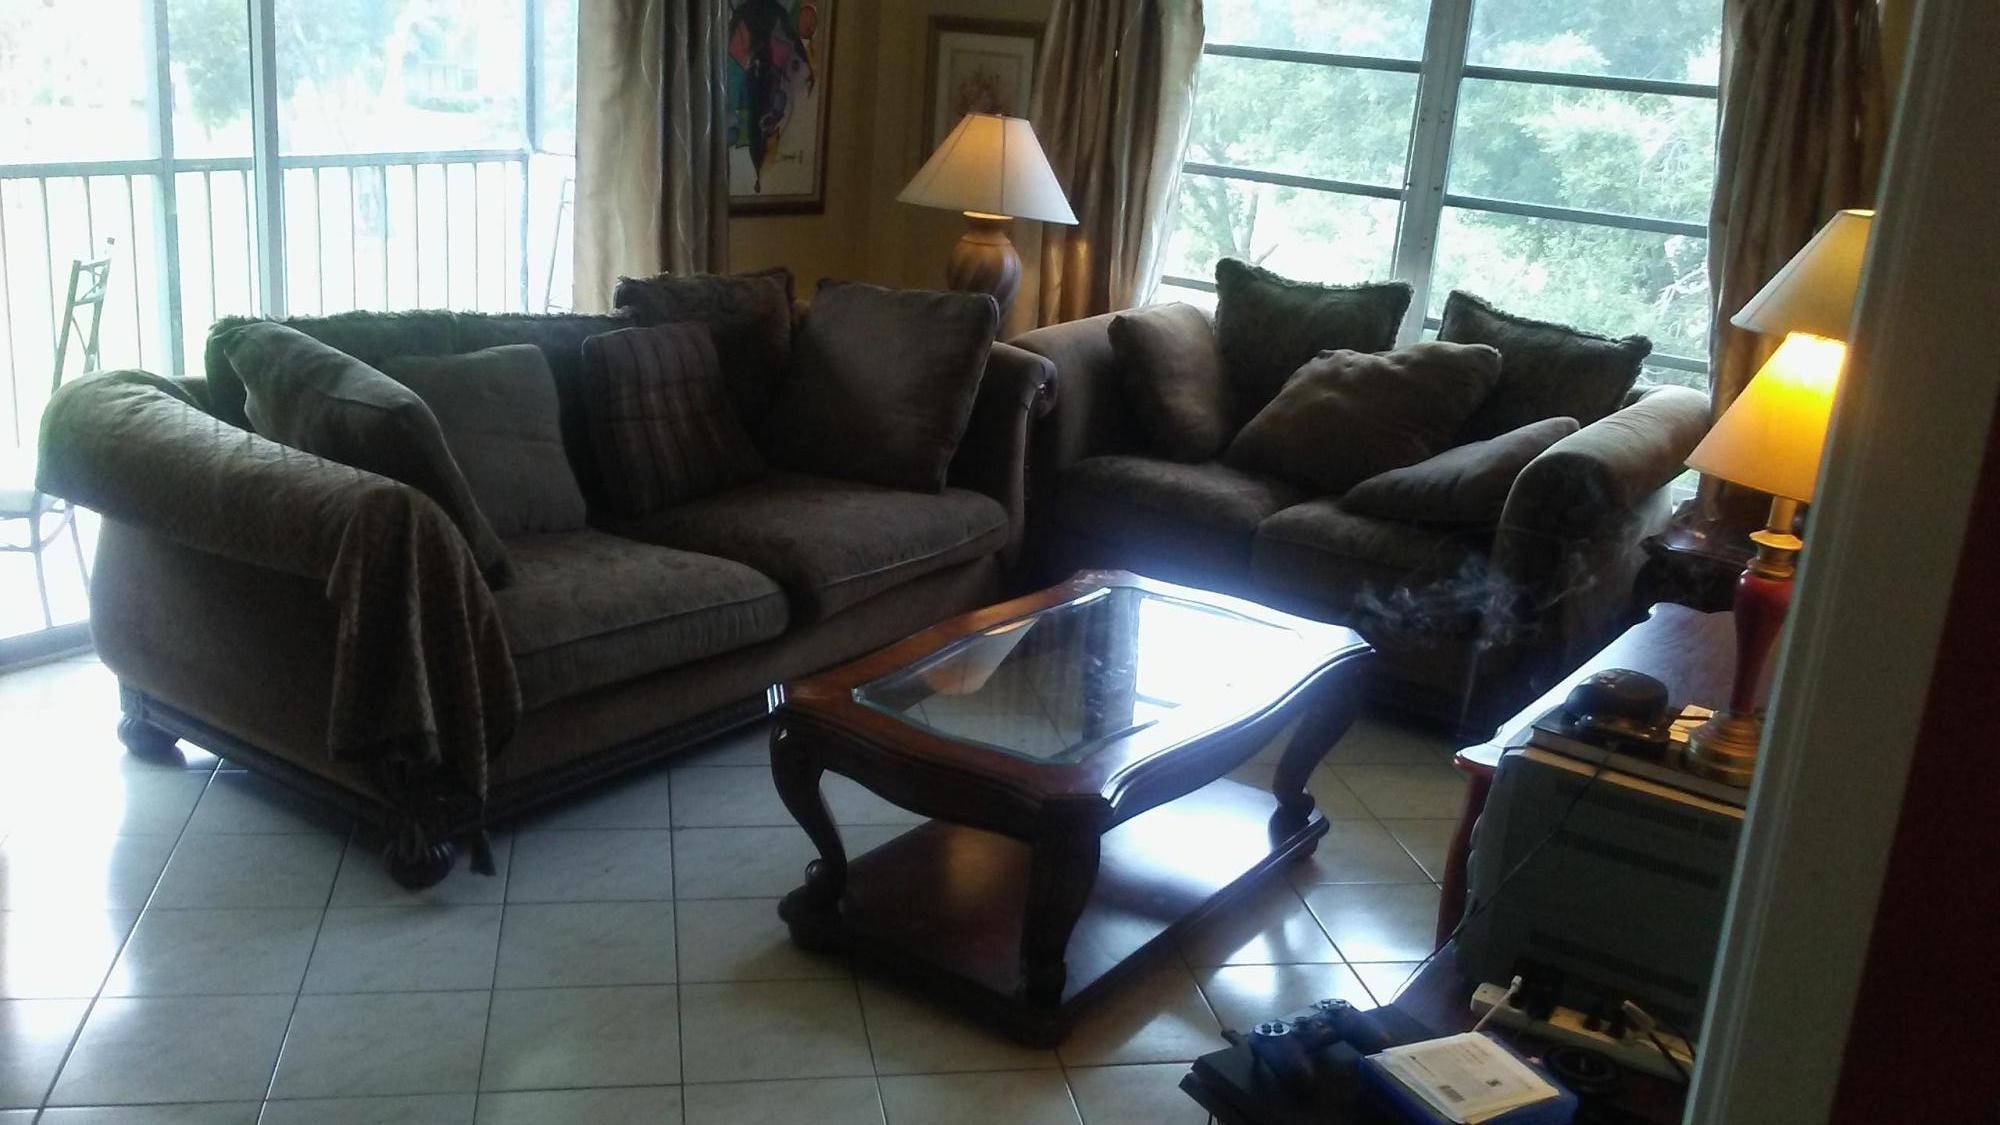 4166 Inverrary Unit 402, Lauderhill, Florida 33319